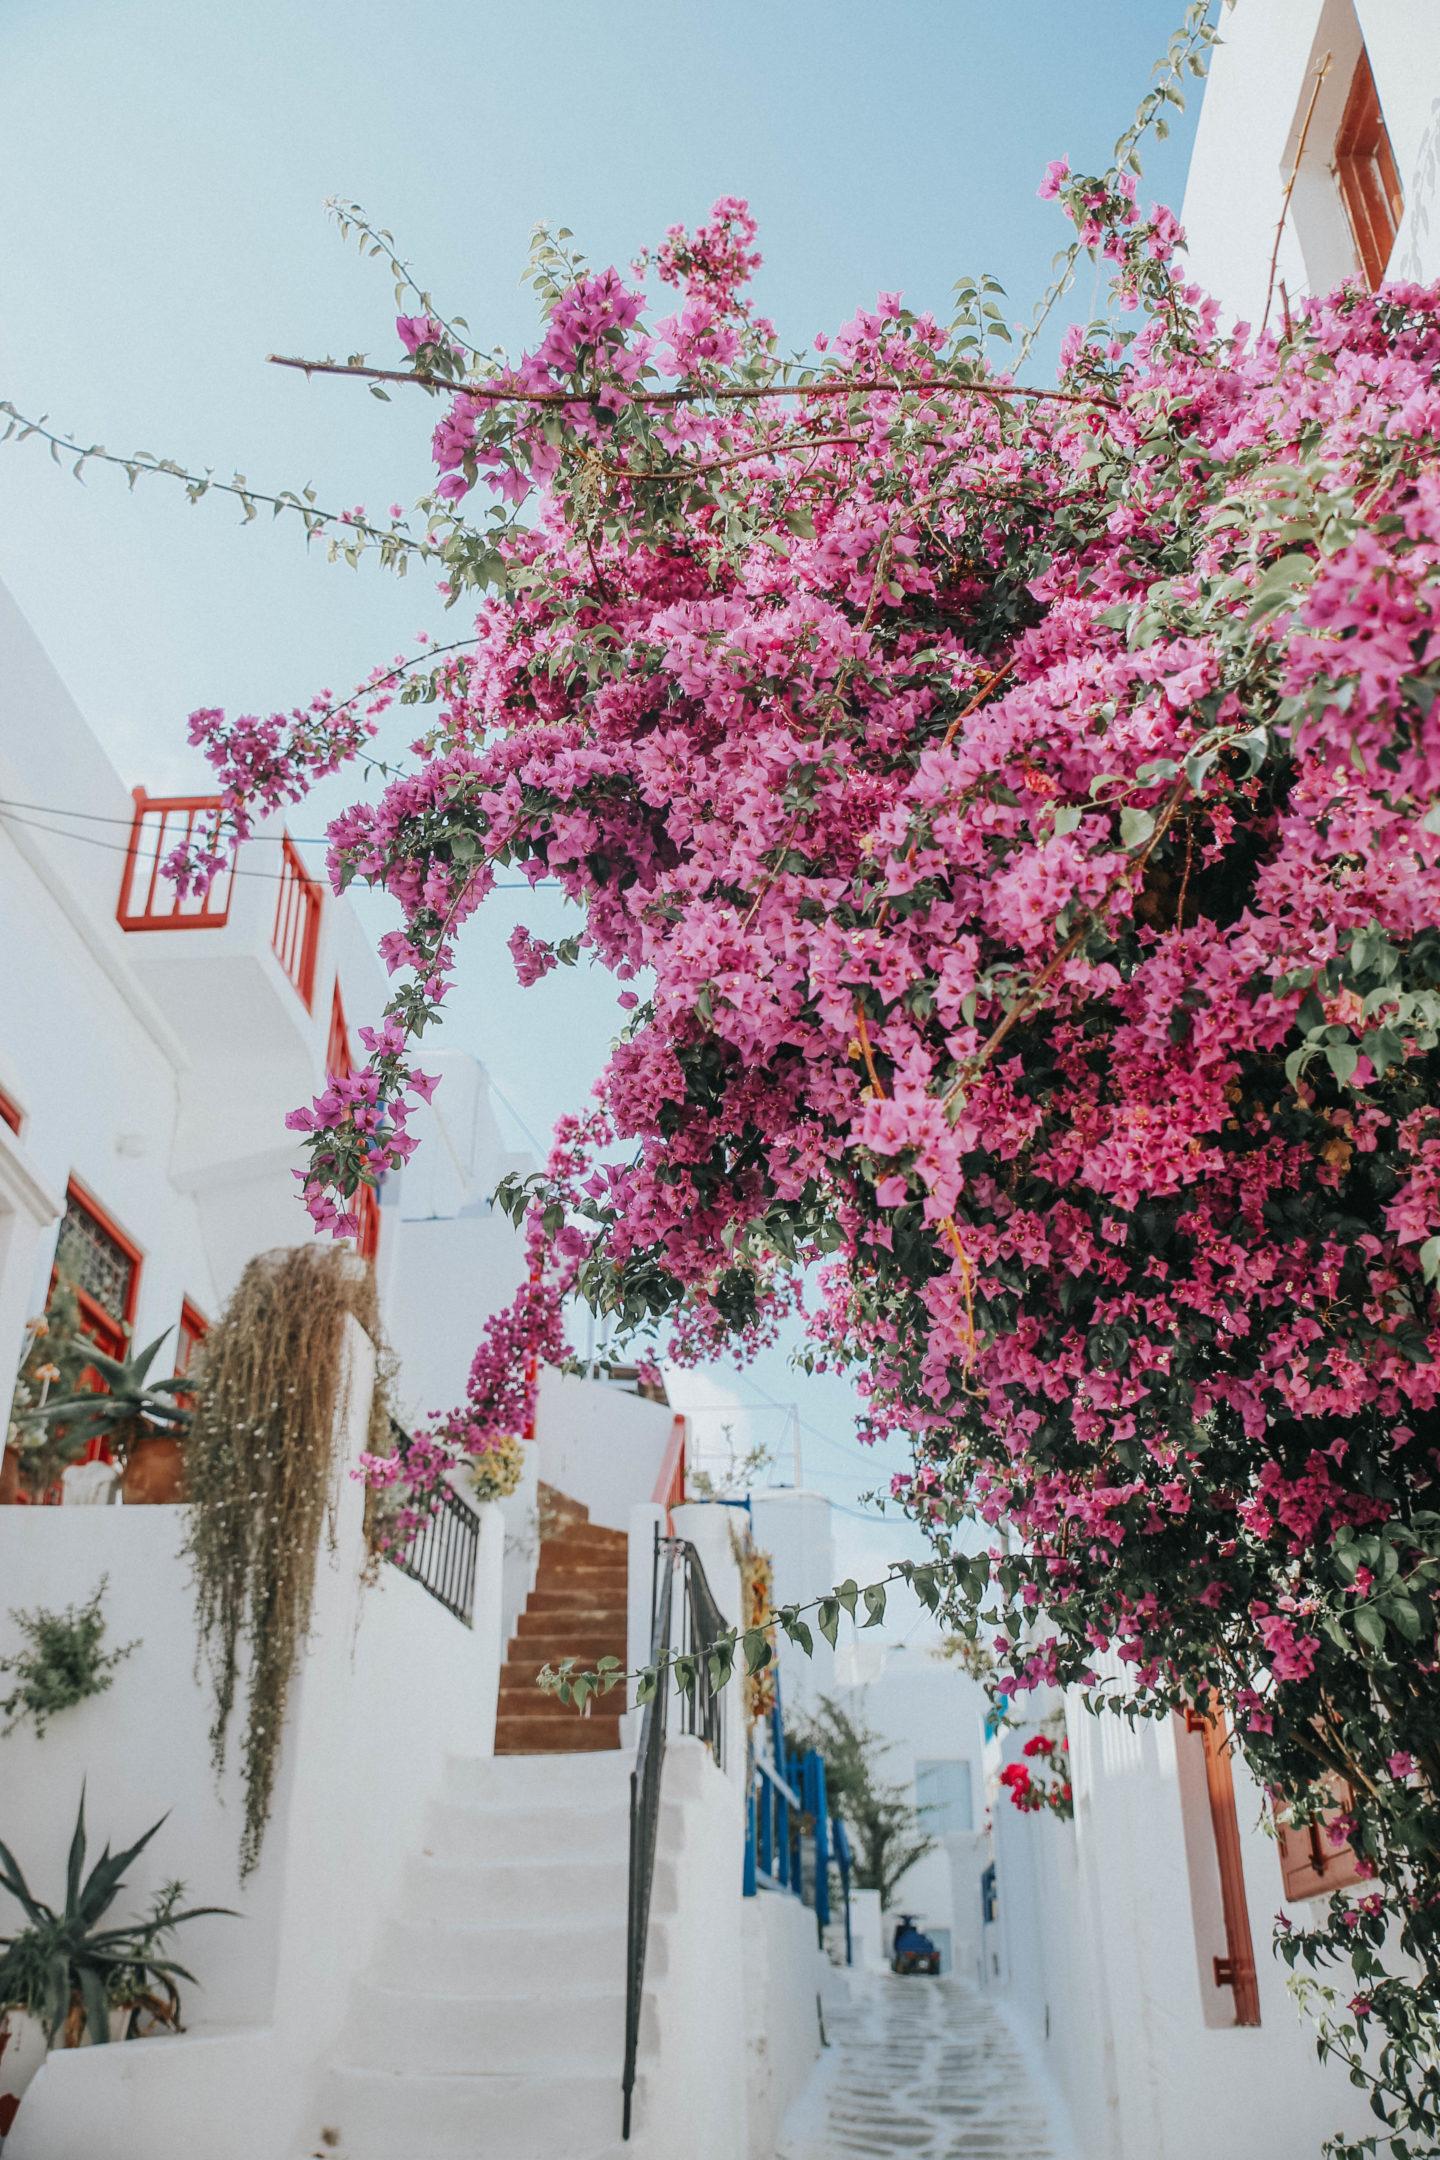 Visiter Mykonos - Blondie Baby blog mode et voyages